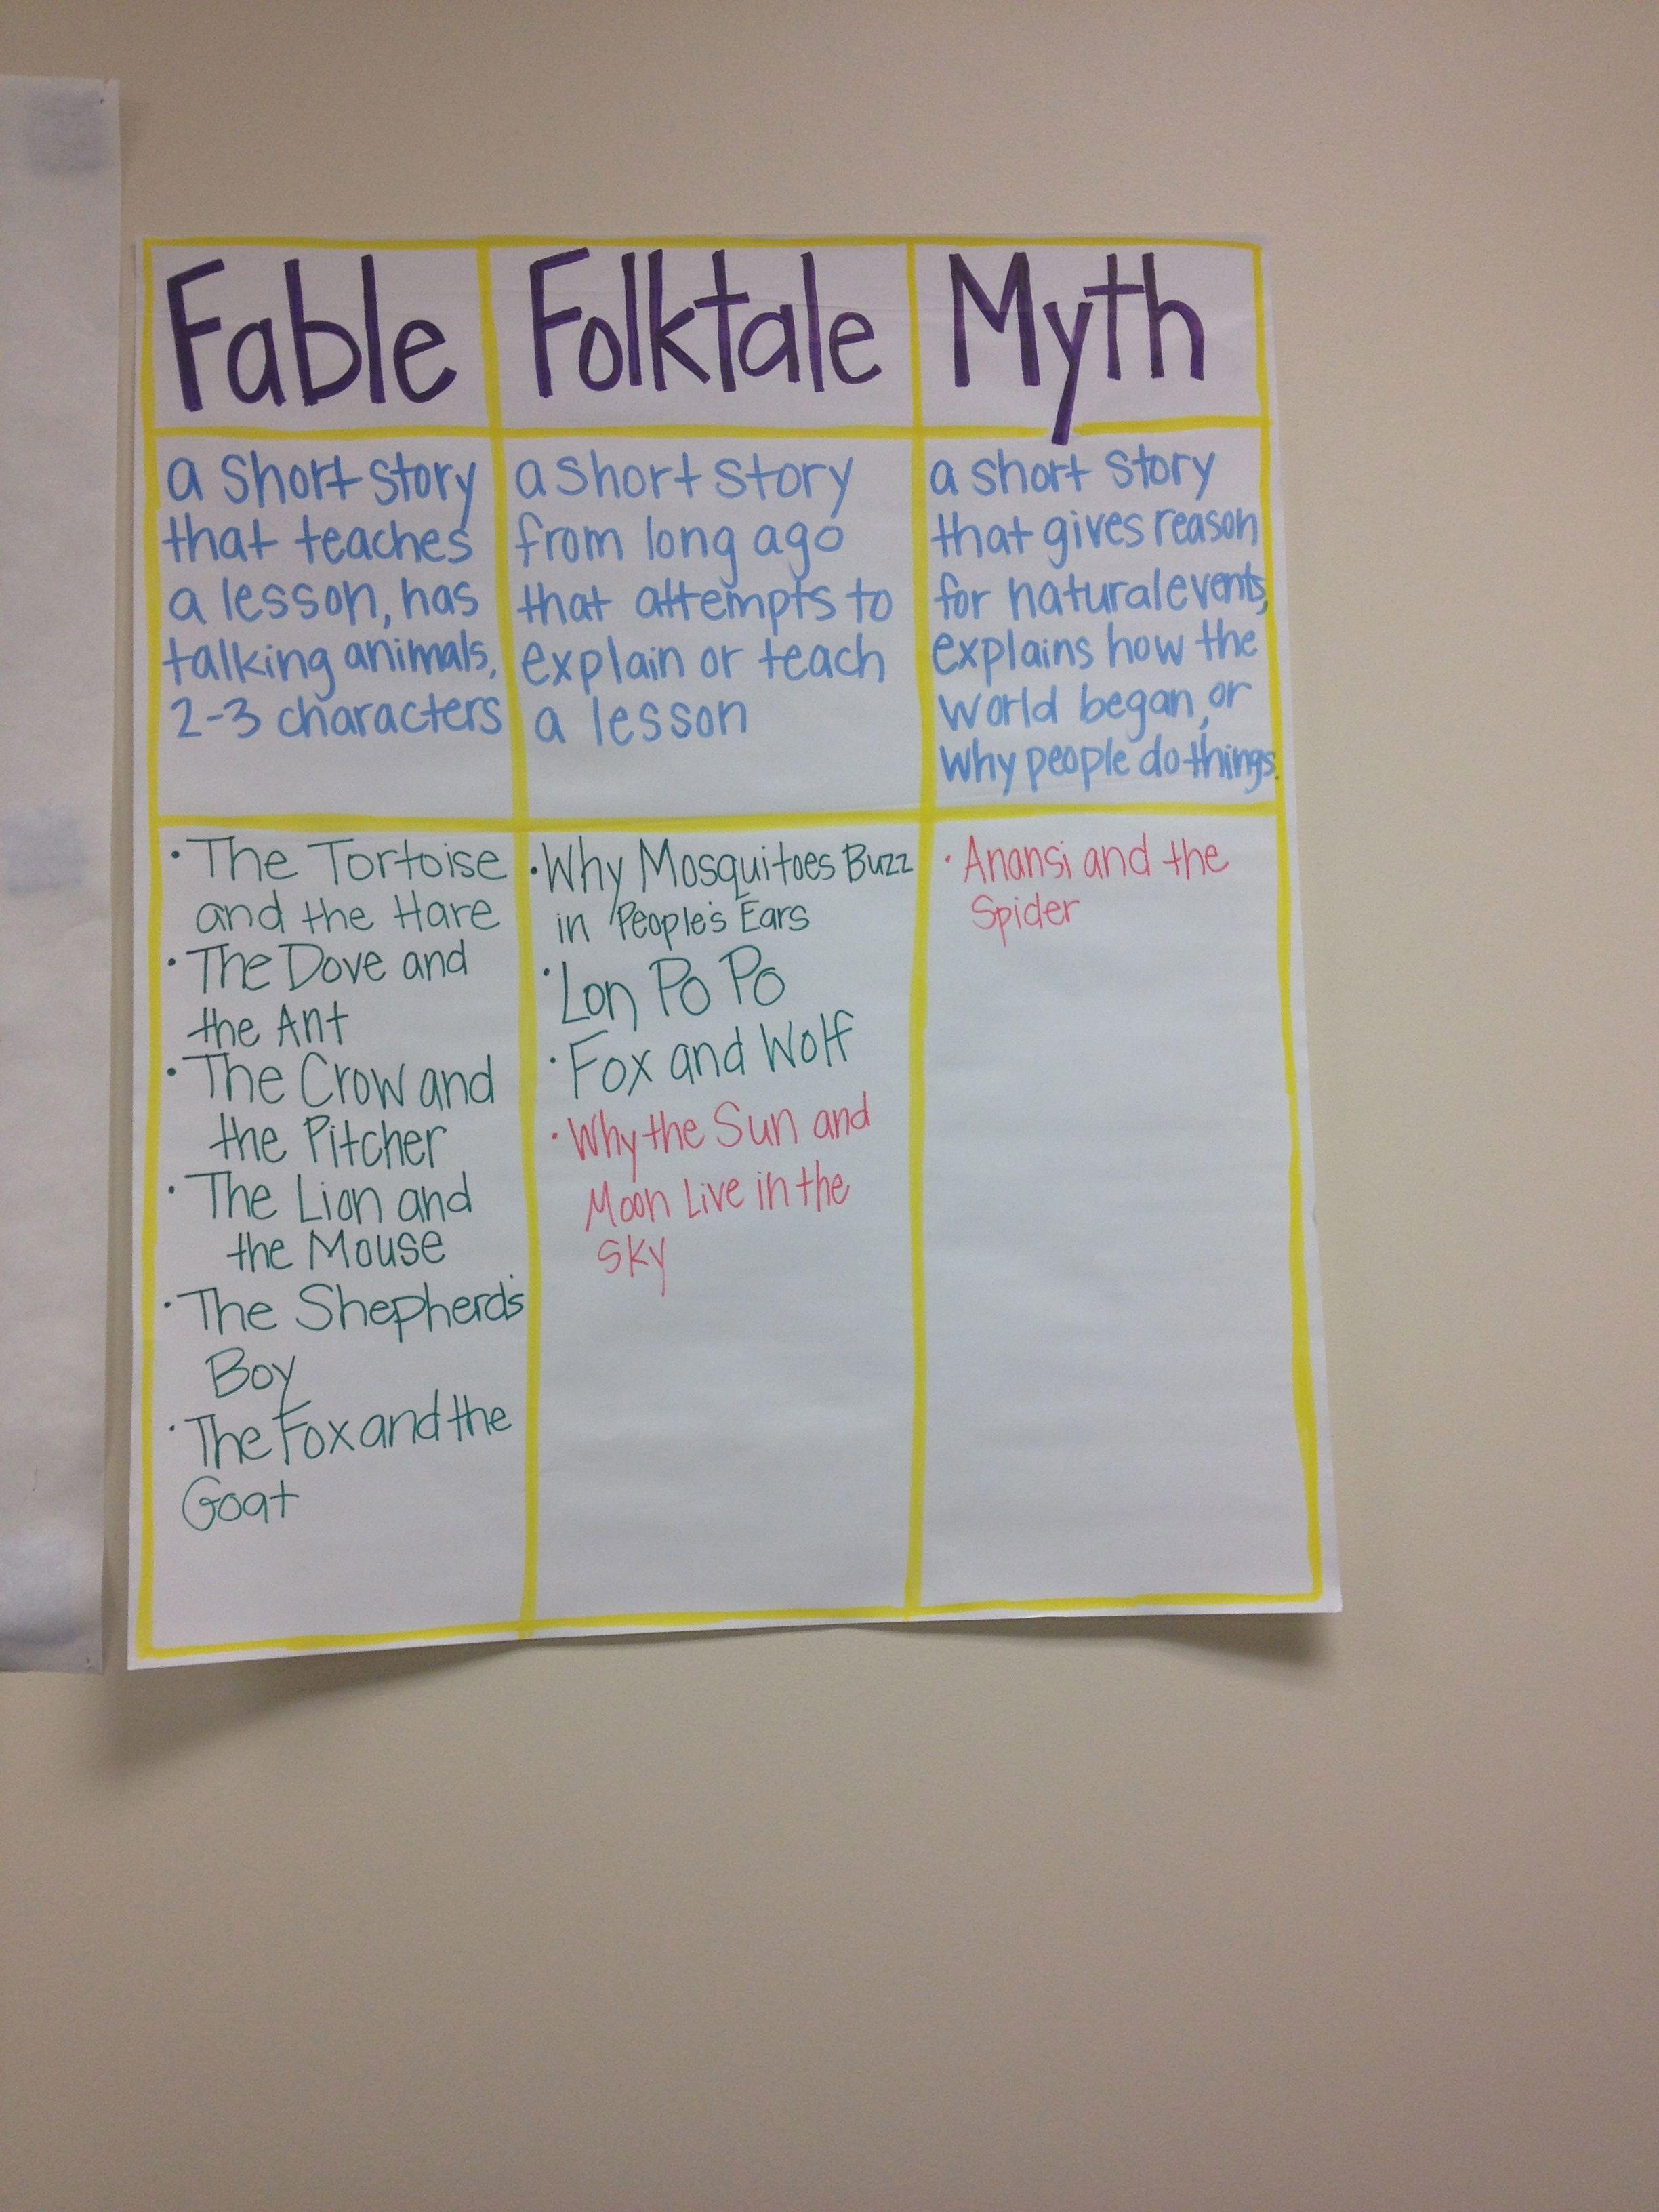 Fable, Folktale, Myth Anchor chart-description of each, with ...